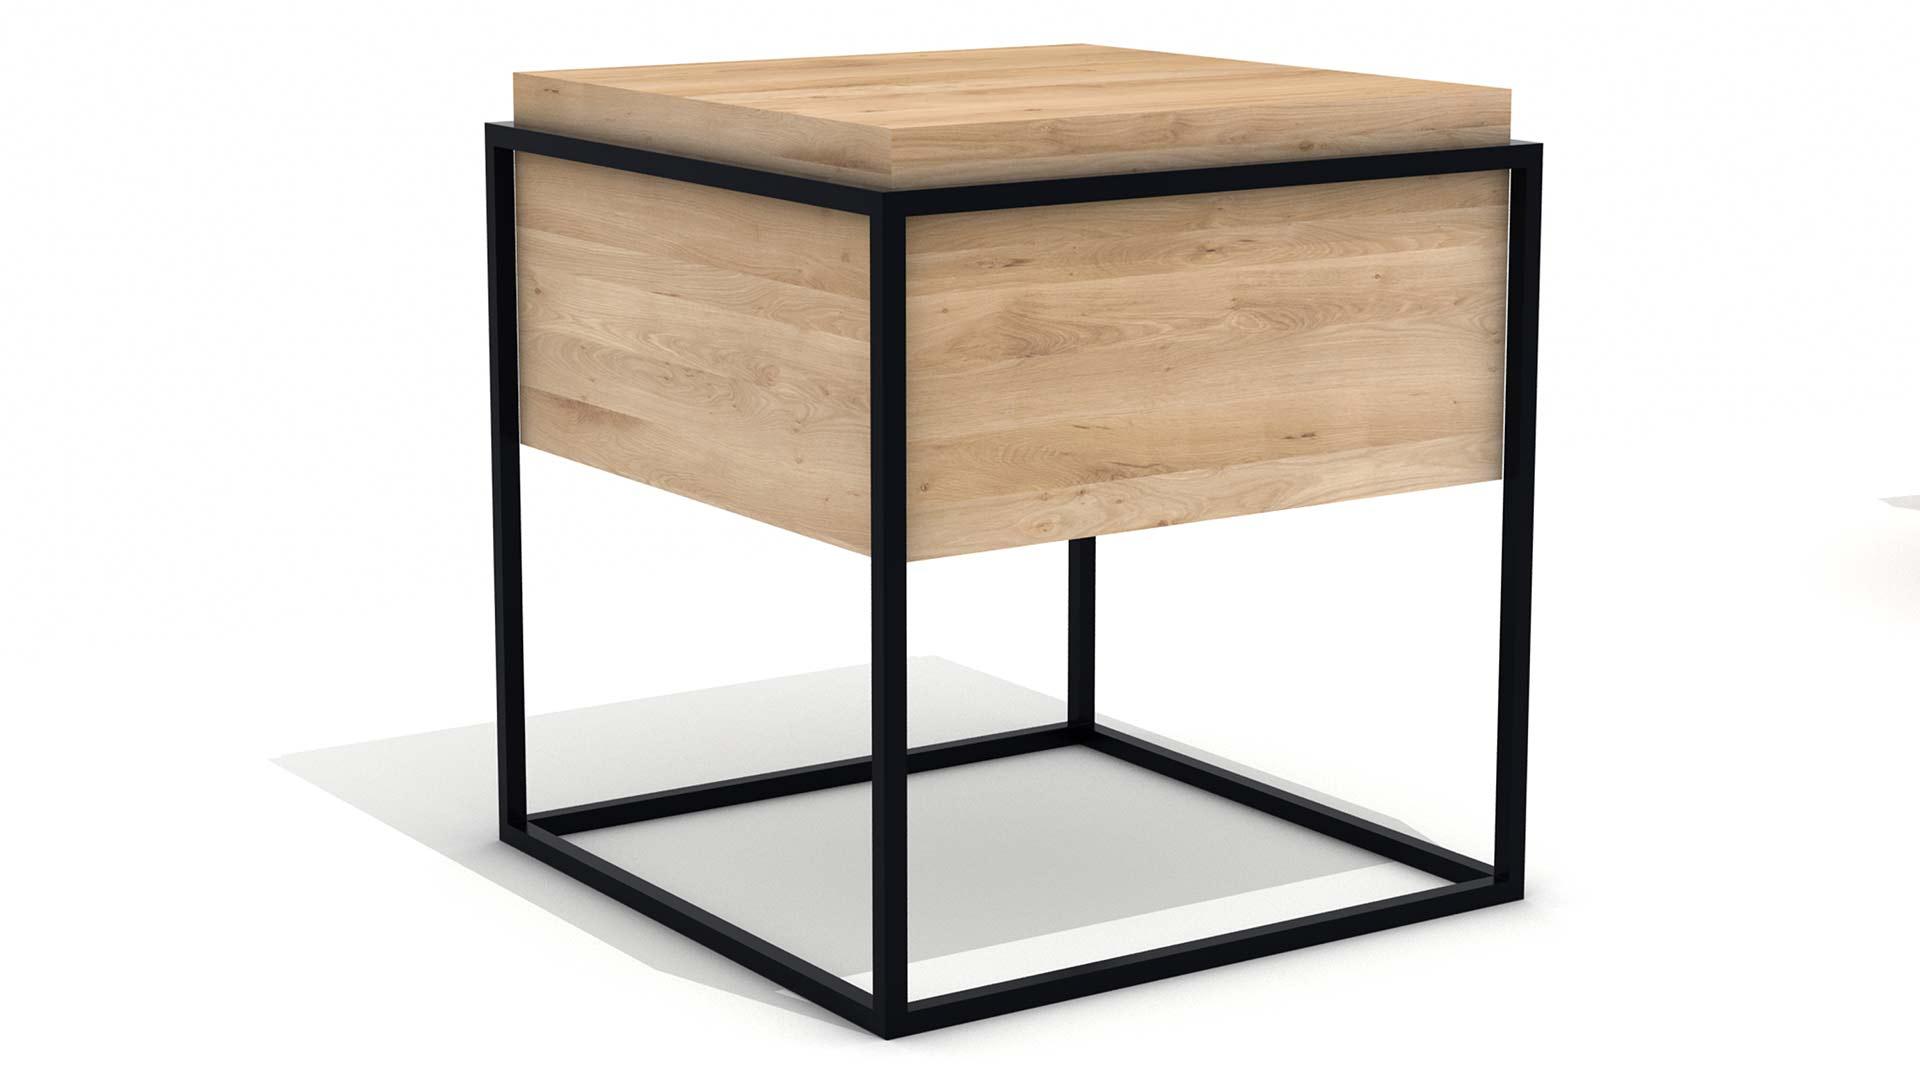 Ethnicraft-Monolit-bedside-table-M-oak-and-black-47x47x51